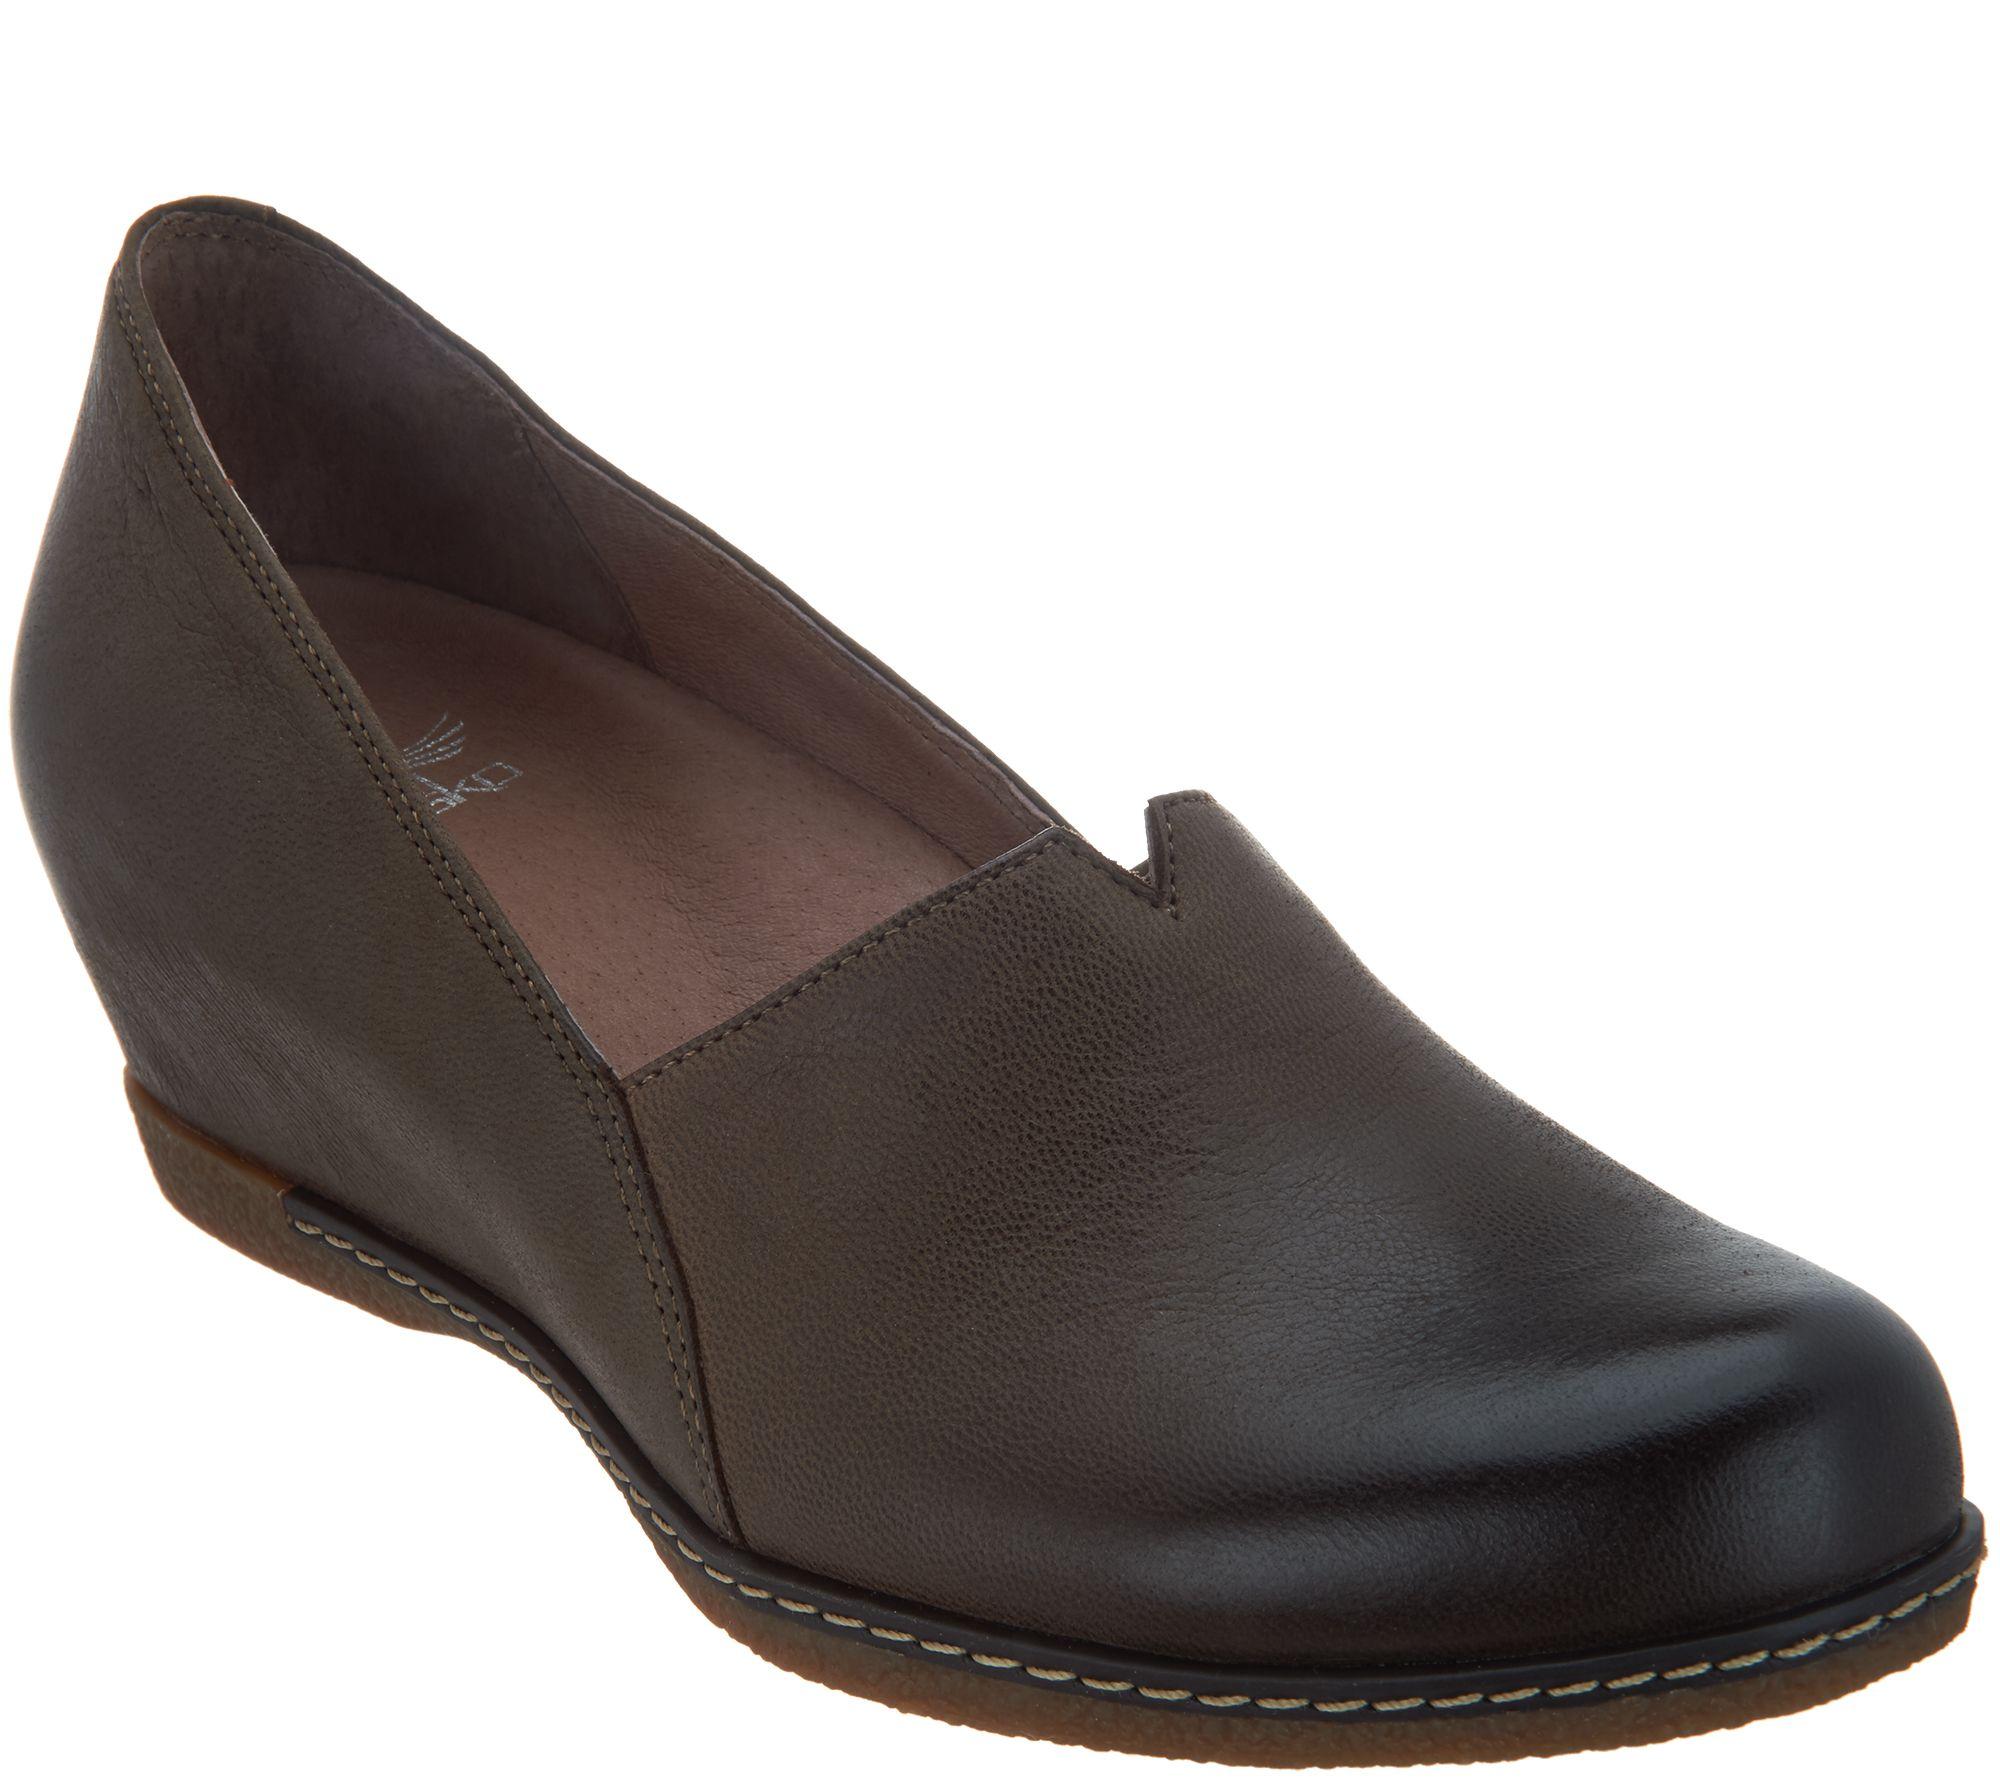 69100555870 Dansko Nubuck Leather Closed Toe Wedges - Liliana - Page 1 — QVC.com